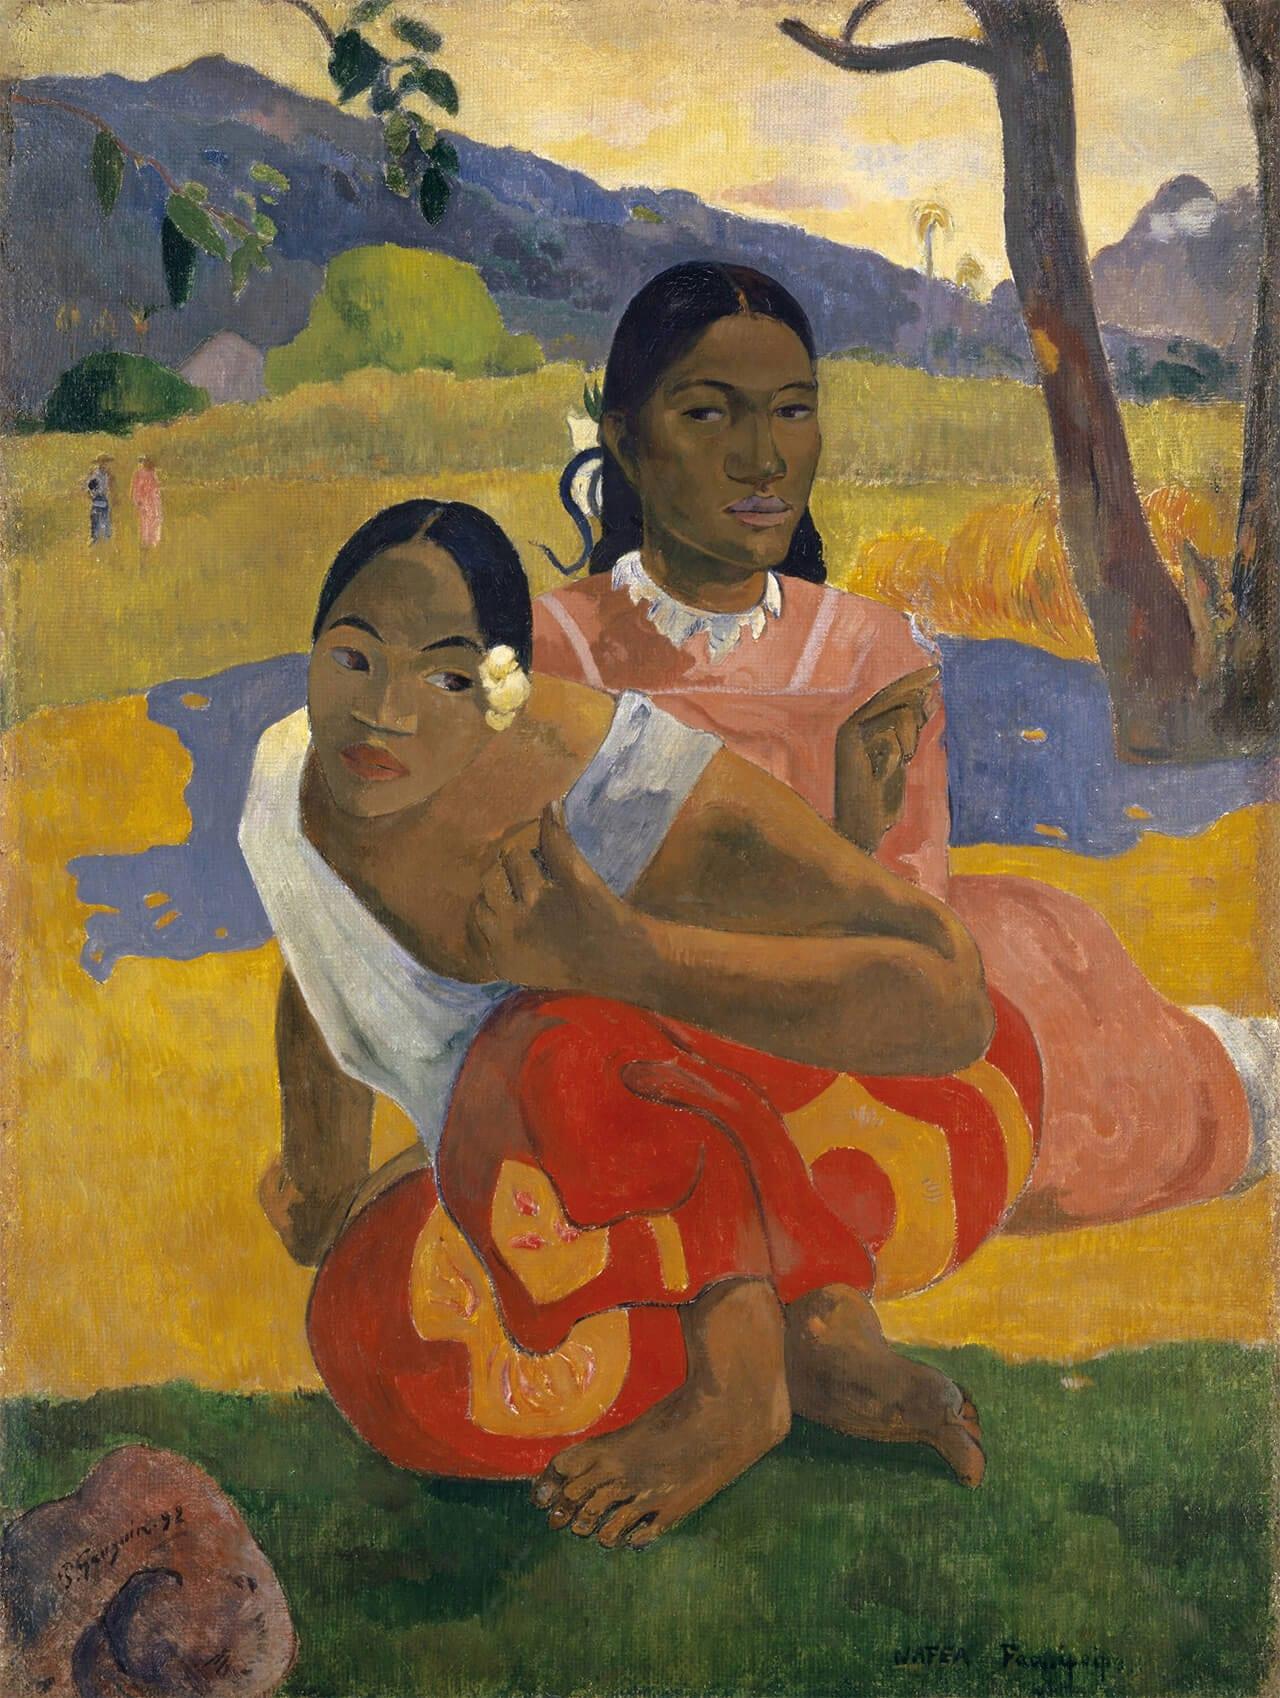 Nafea Faa Ipoipo (Wann heiratest Du?), 1892 © Privatsammlung Aus: Der Gauguin Atlas, Sieveking Verlag 2018